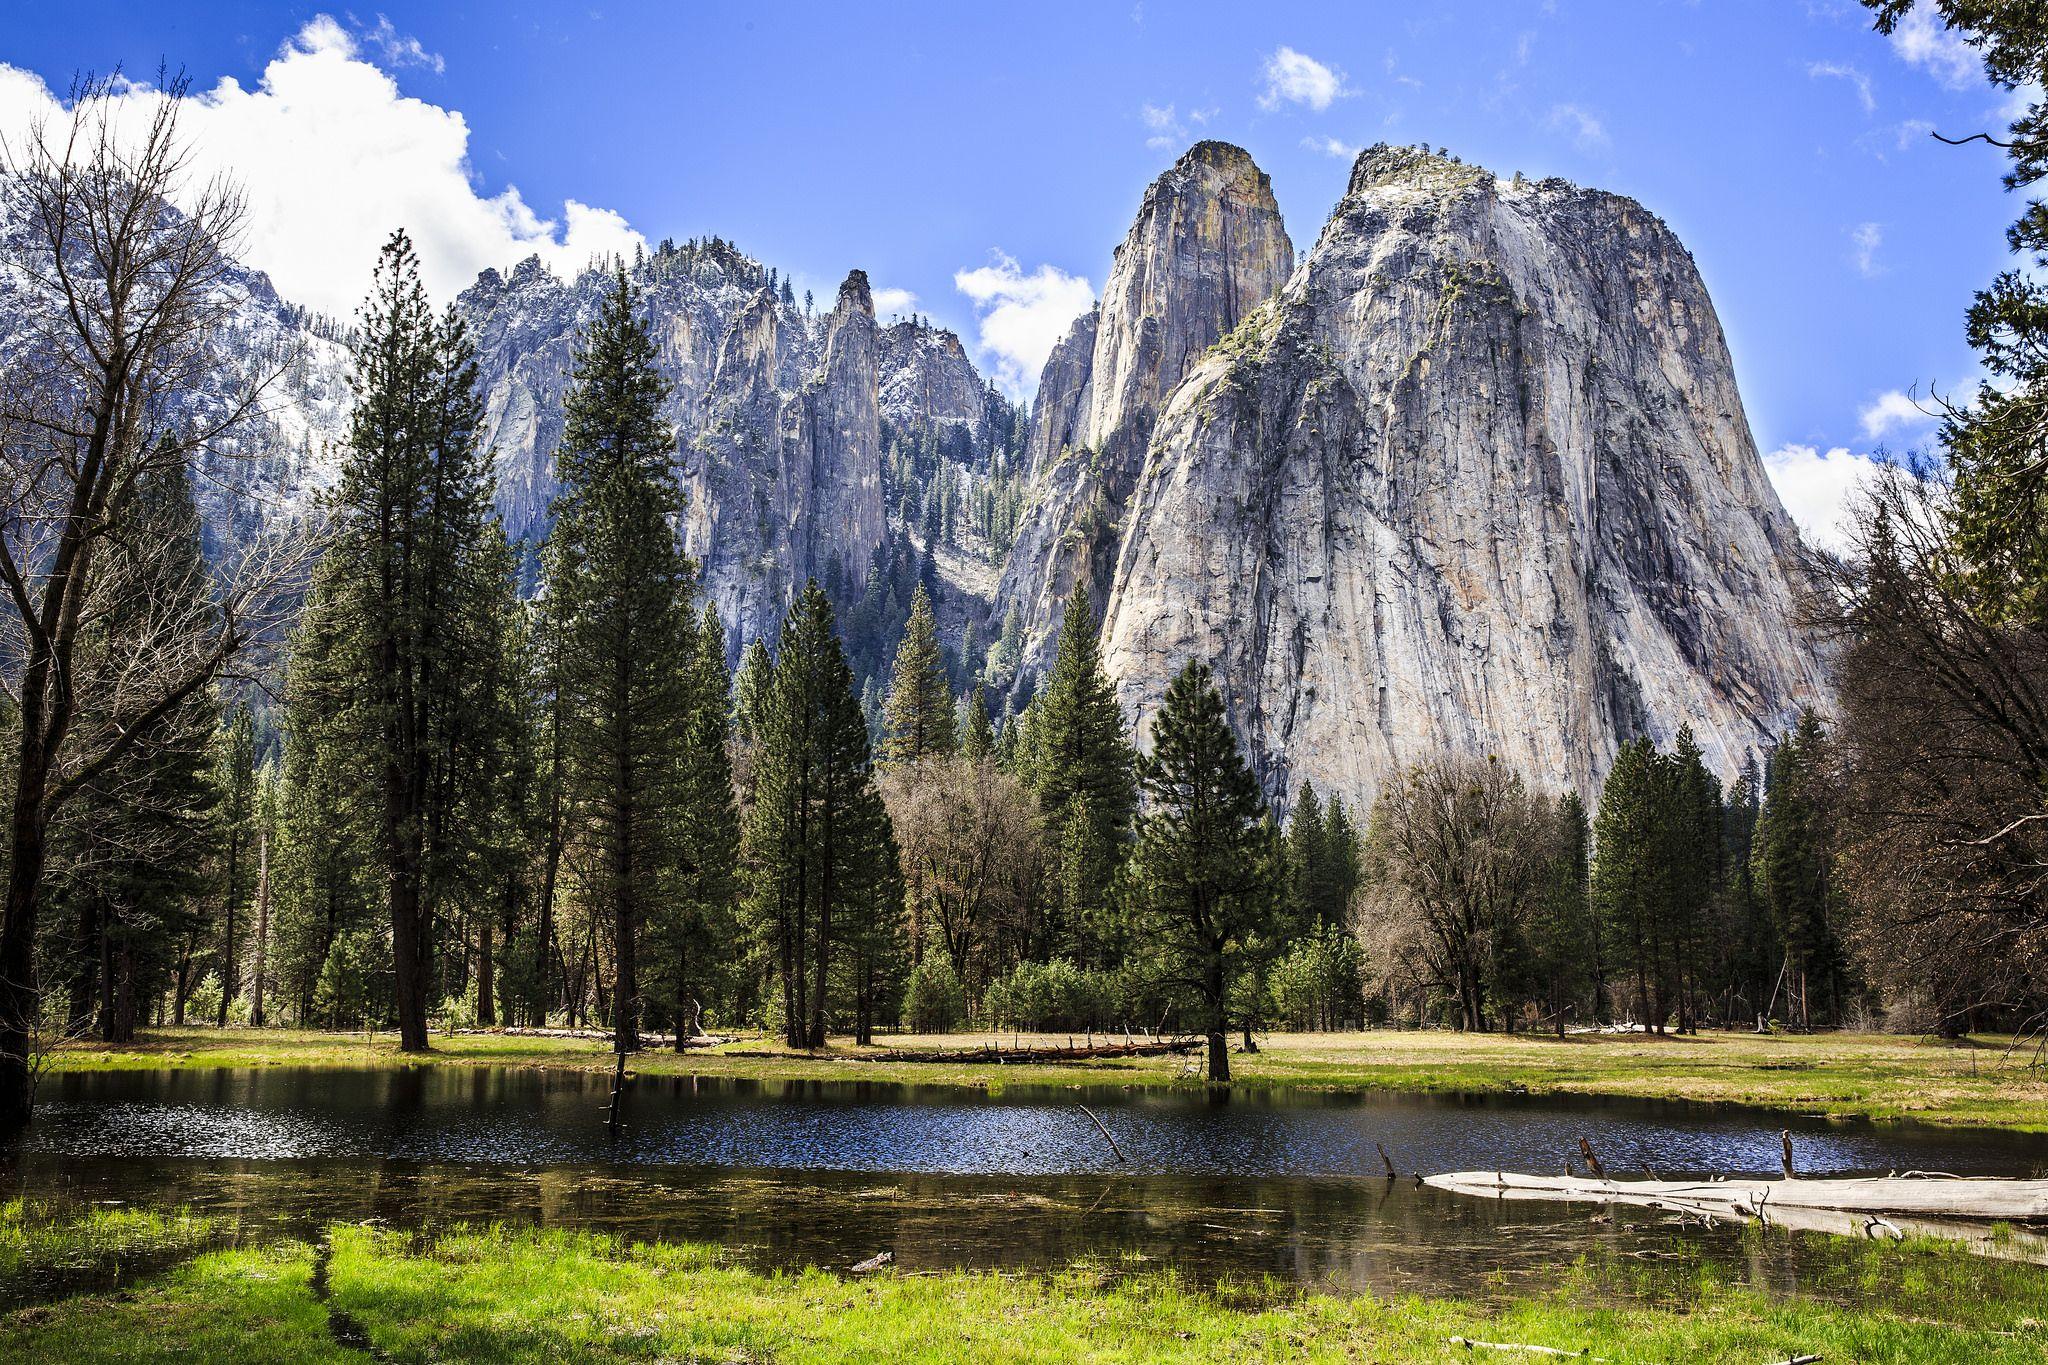 Pin by Susan Carrell on Beautiful - Mountains | California